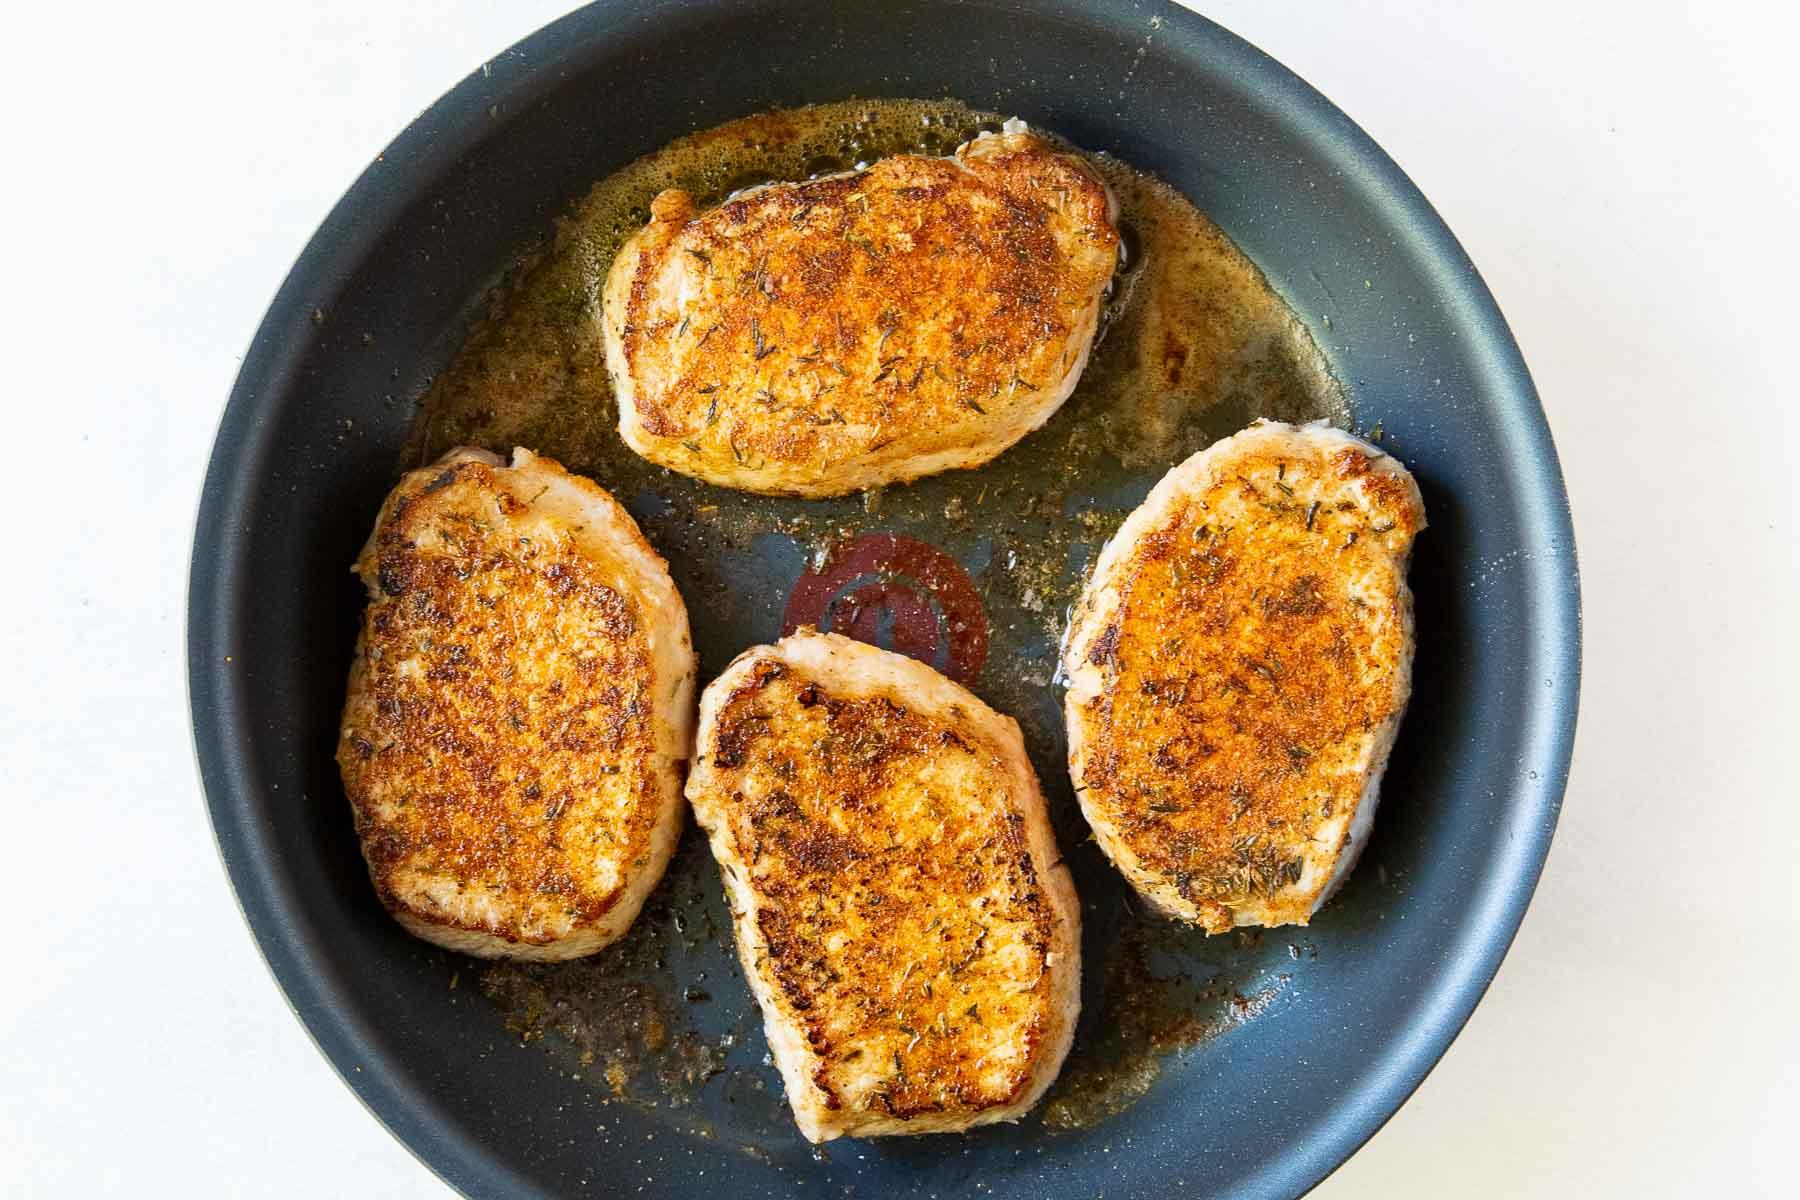 browning pork chops in a skillet